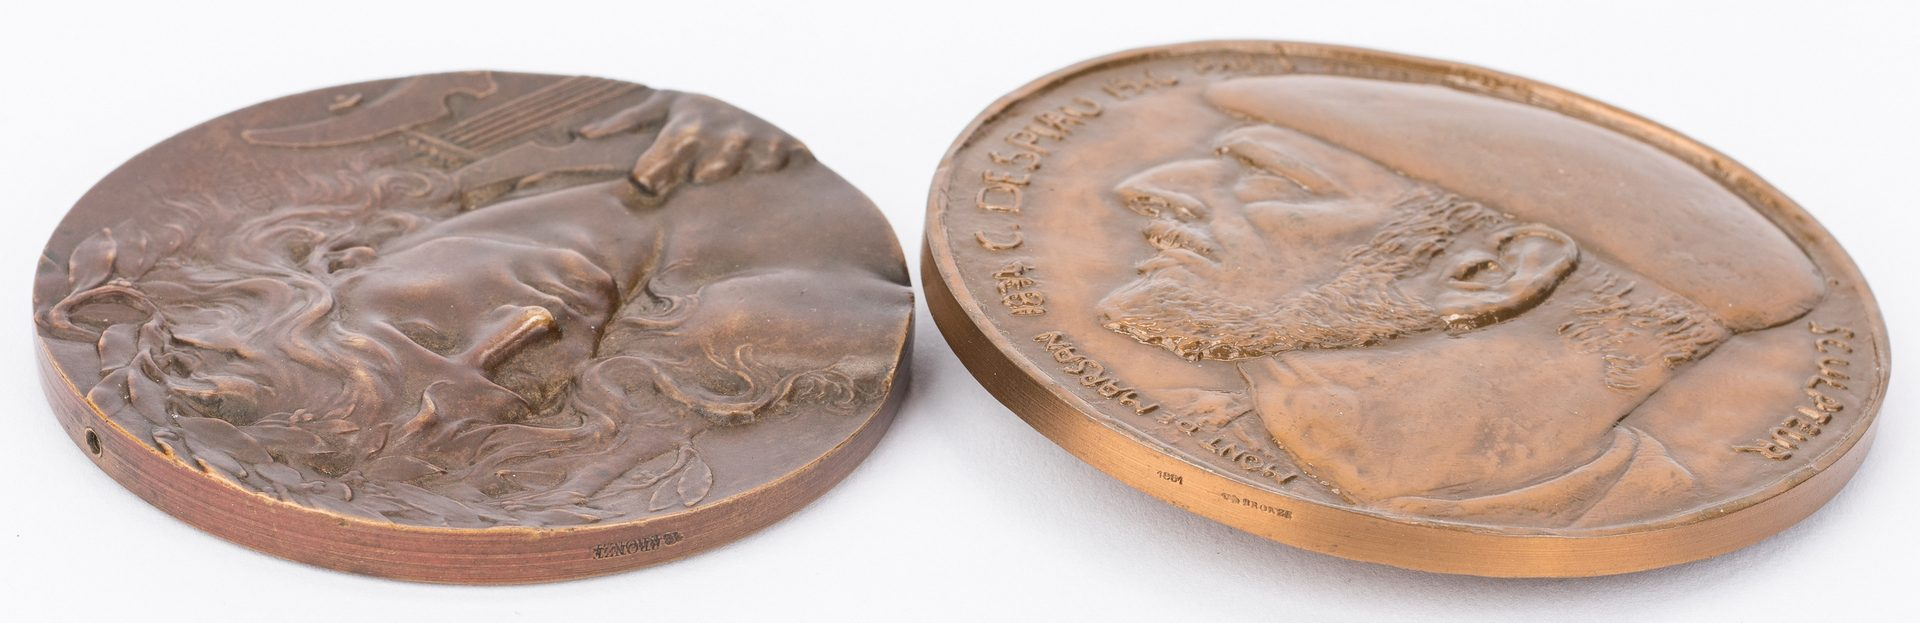 Lot 209: 11 Poet & Artist Related Bronze Medals & Plaques